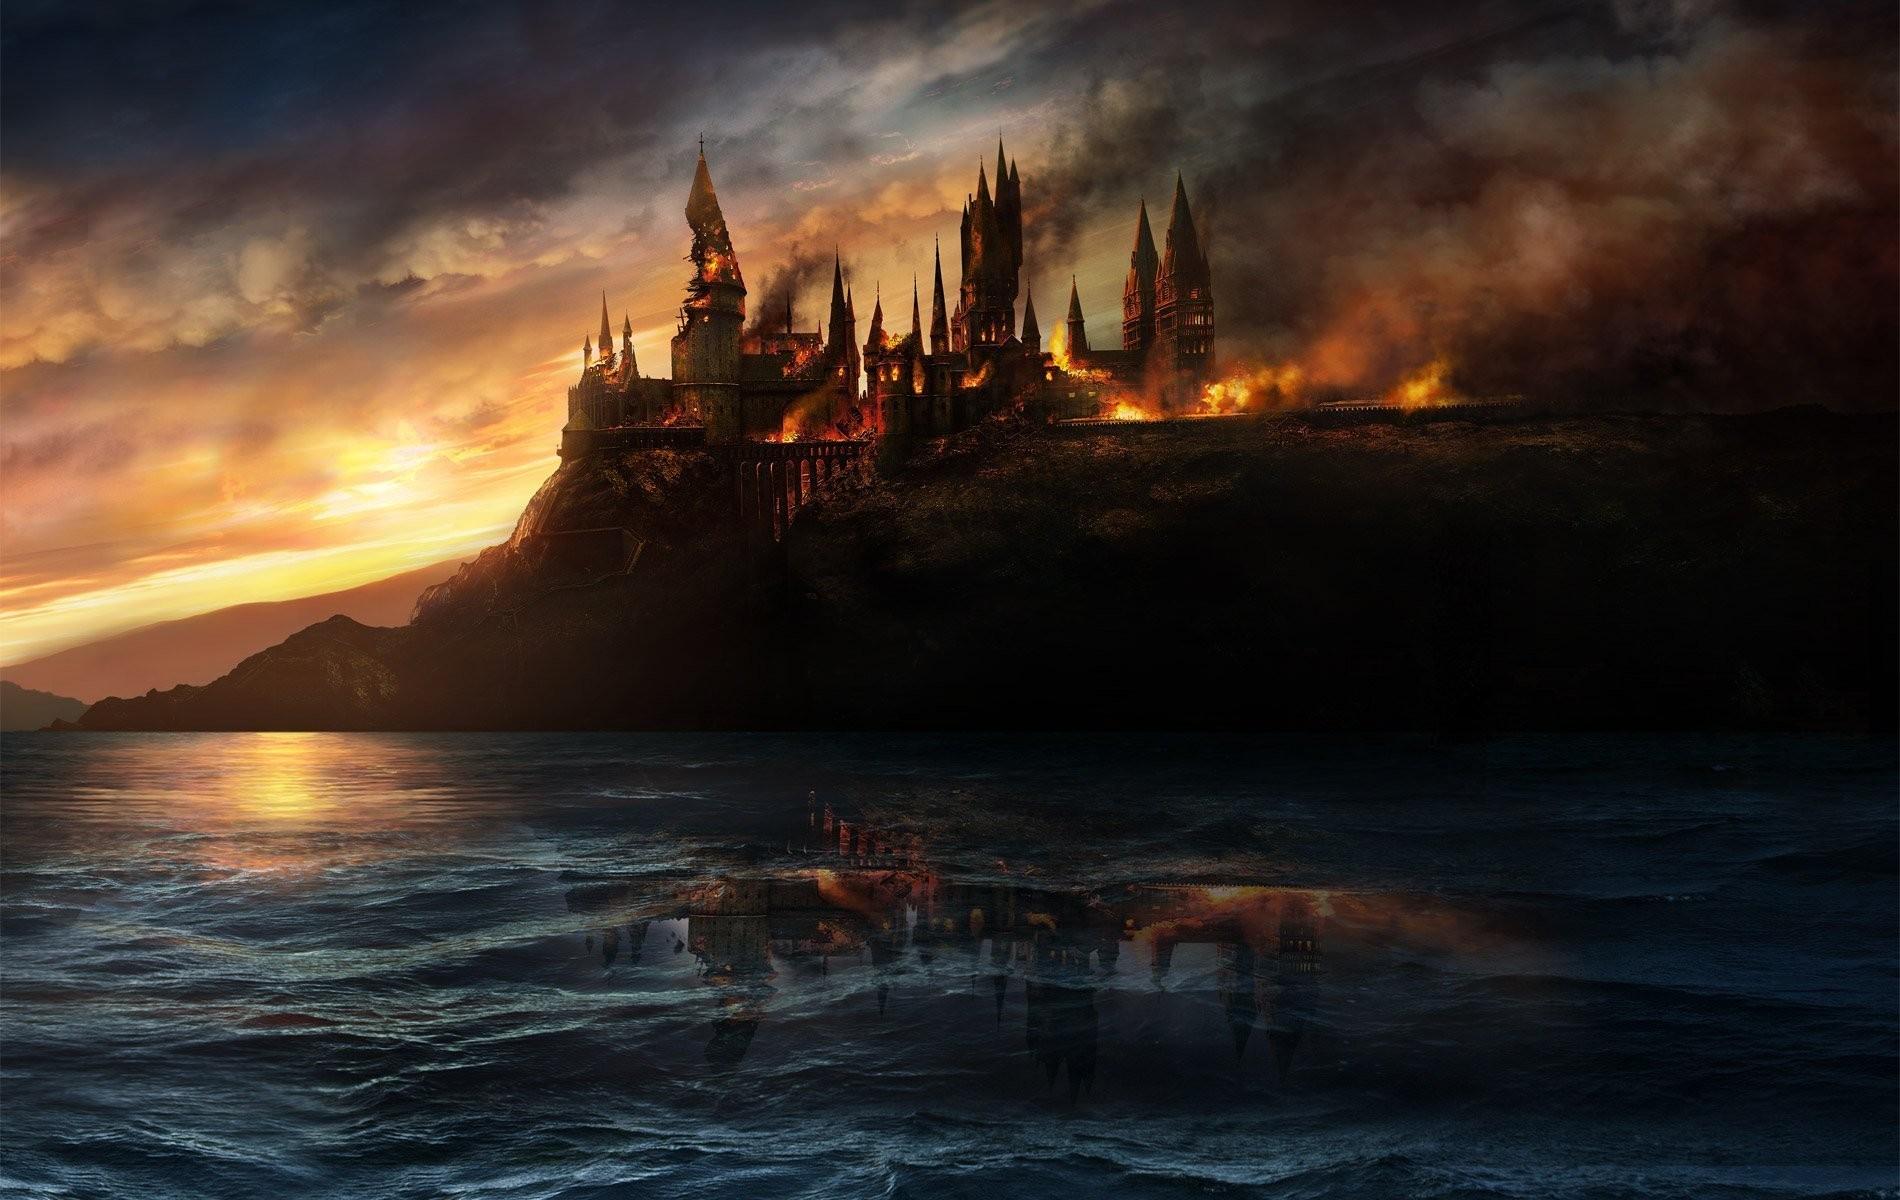 Good Wallpaper Harry Potter Concept Art - sunset-sea-movies-sunrise-evening-coast-Harry-Potter-dusk-destruction-Hogwarts-ghost-ship-dawn-wave-screenshot-computer-wallpaper-geological-phenomenon-204654  You Should Have_279434.jpg